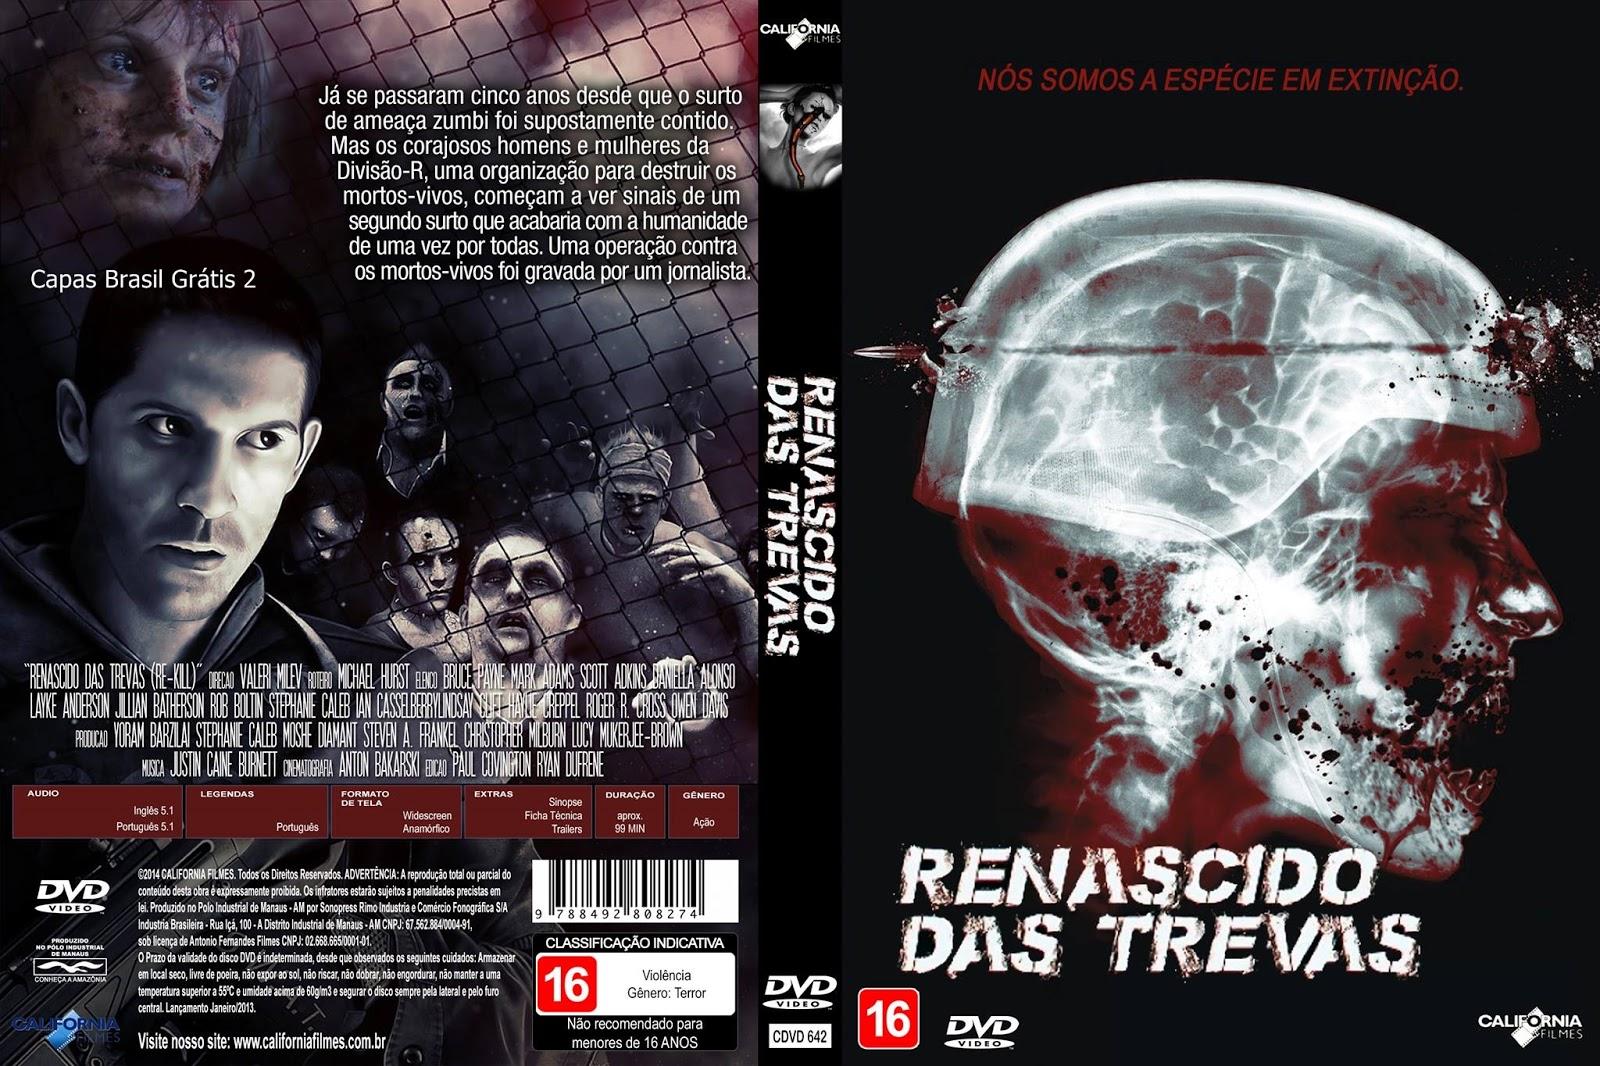 Renascido das Trevas DVDRip XviD Dublado Renascido 2Bdas 2Btrevas